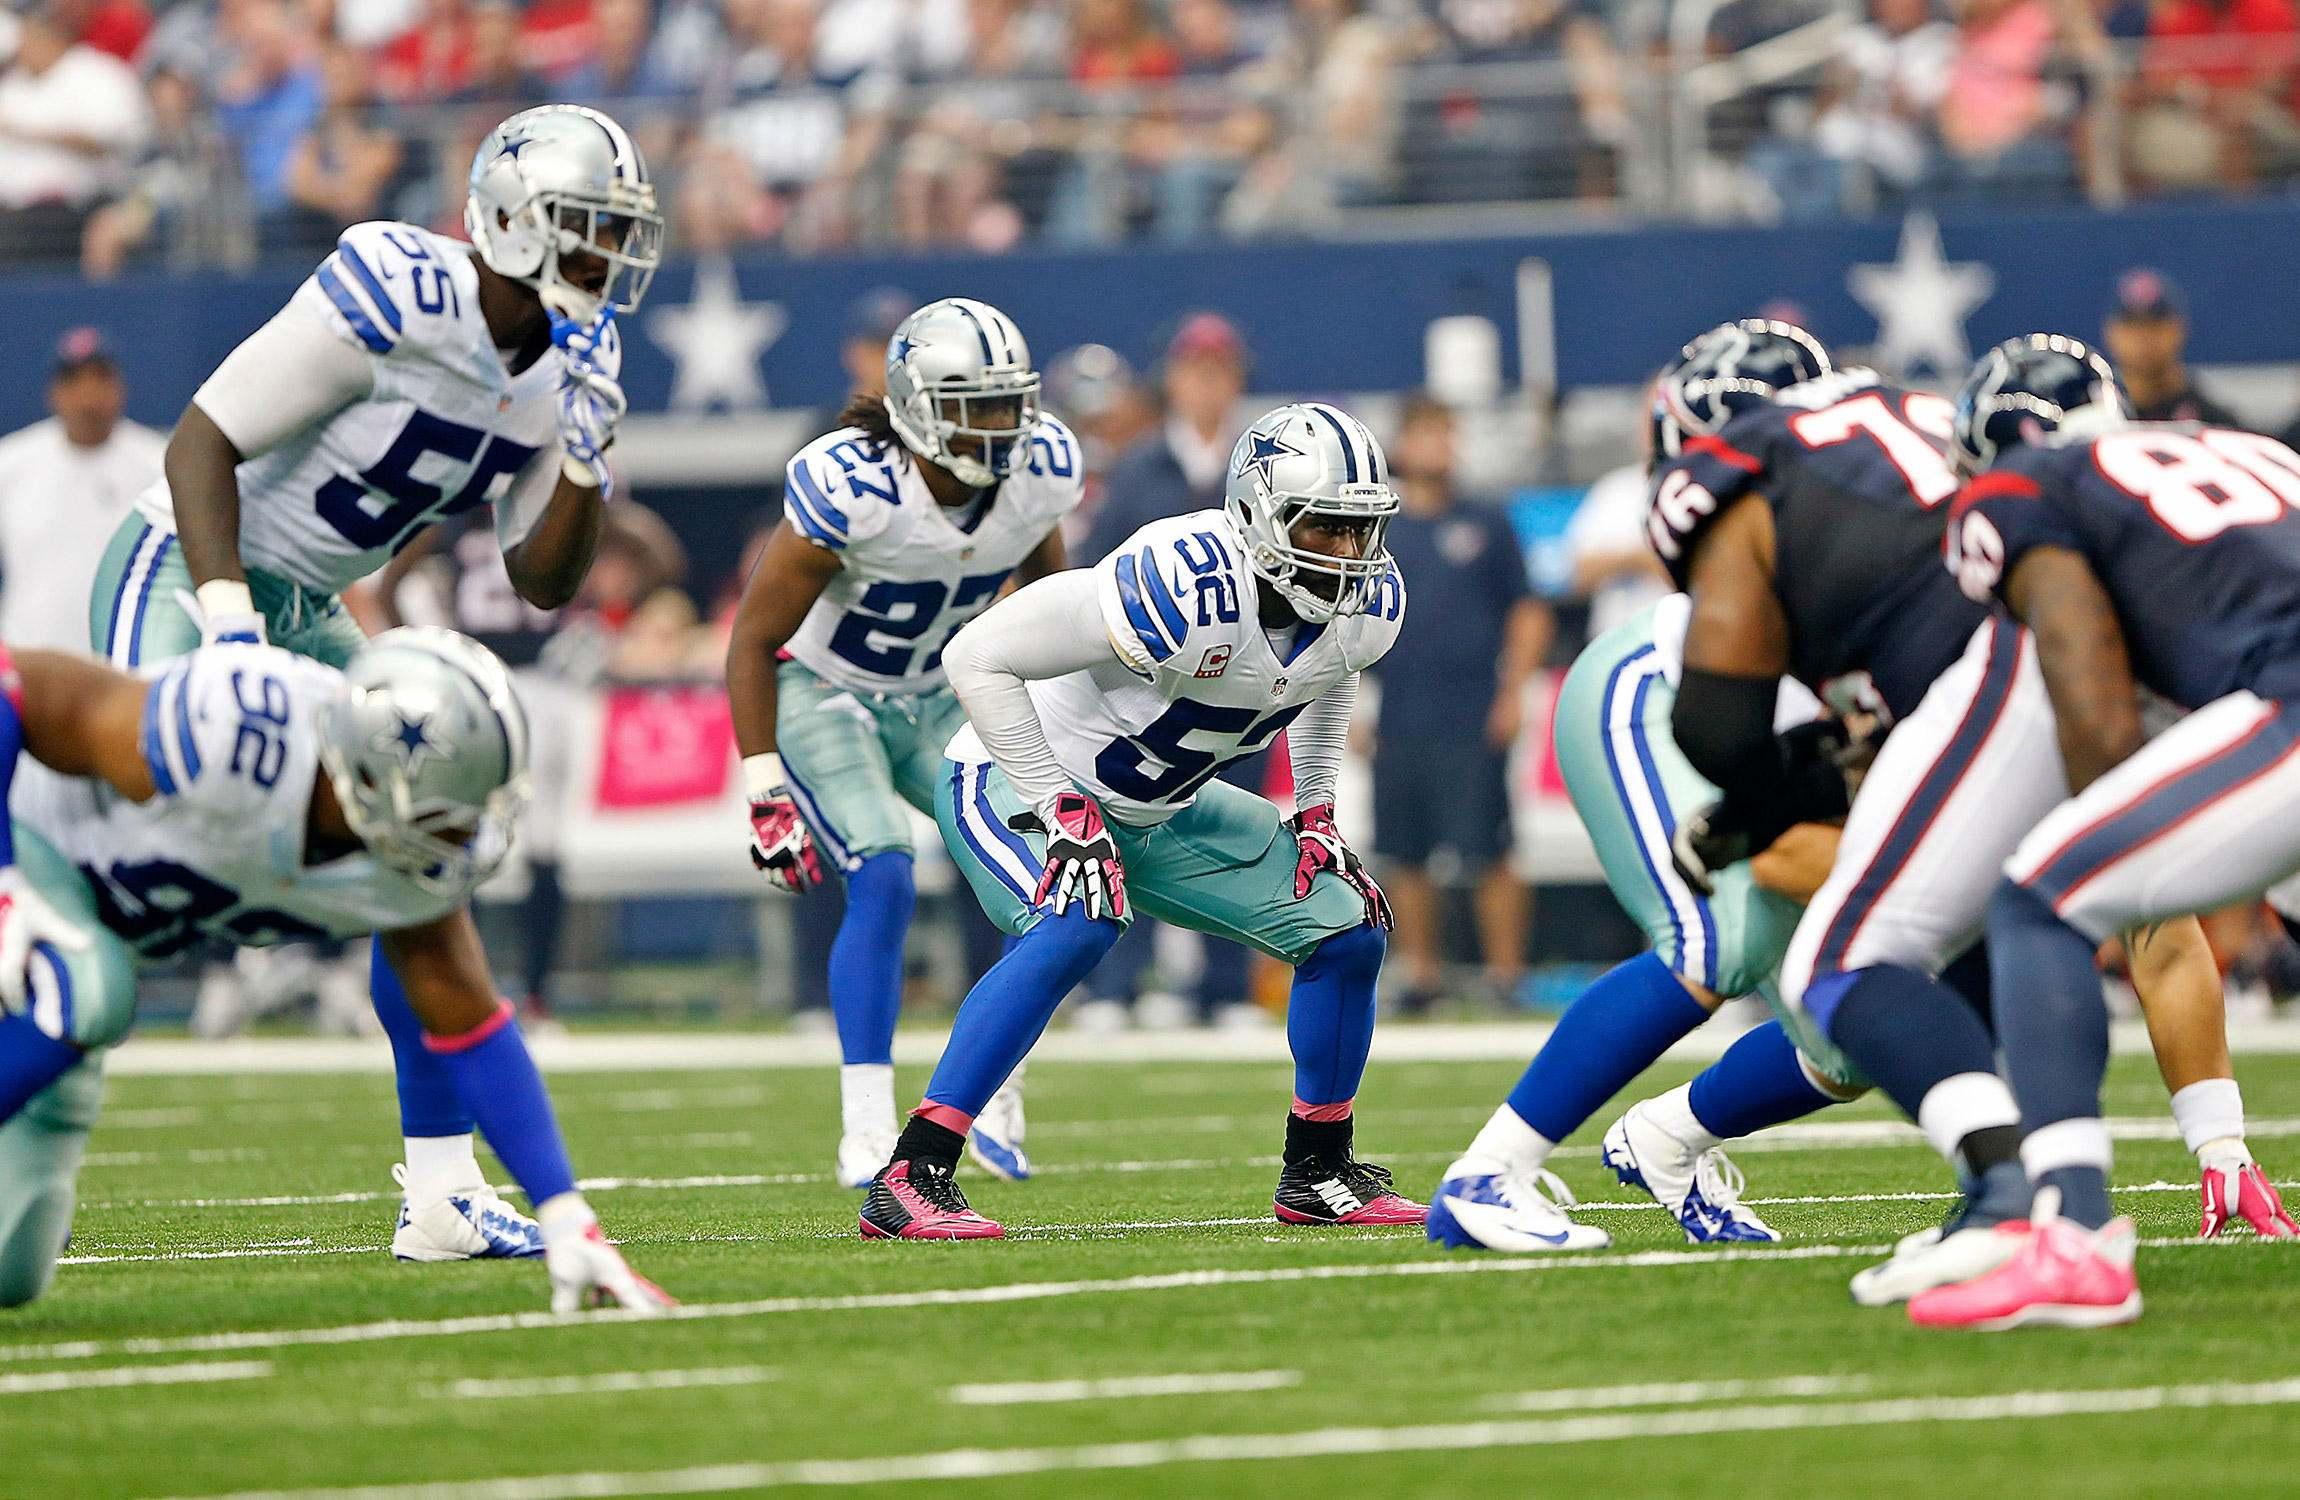 Cowboys Blog - Cowboys Defense: Identifying Needs & Strategies, Part 2/3